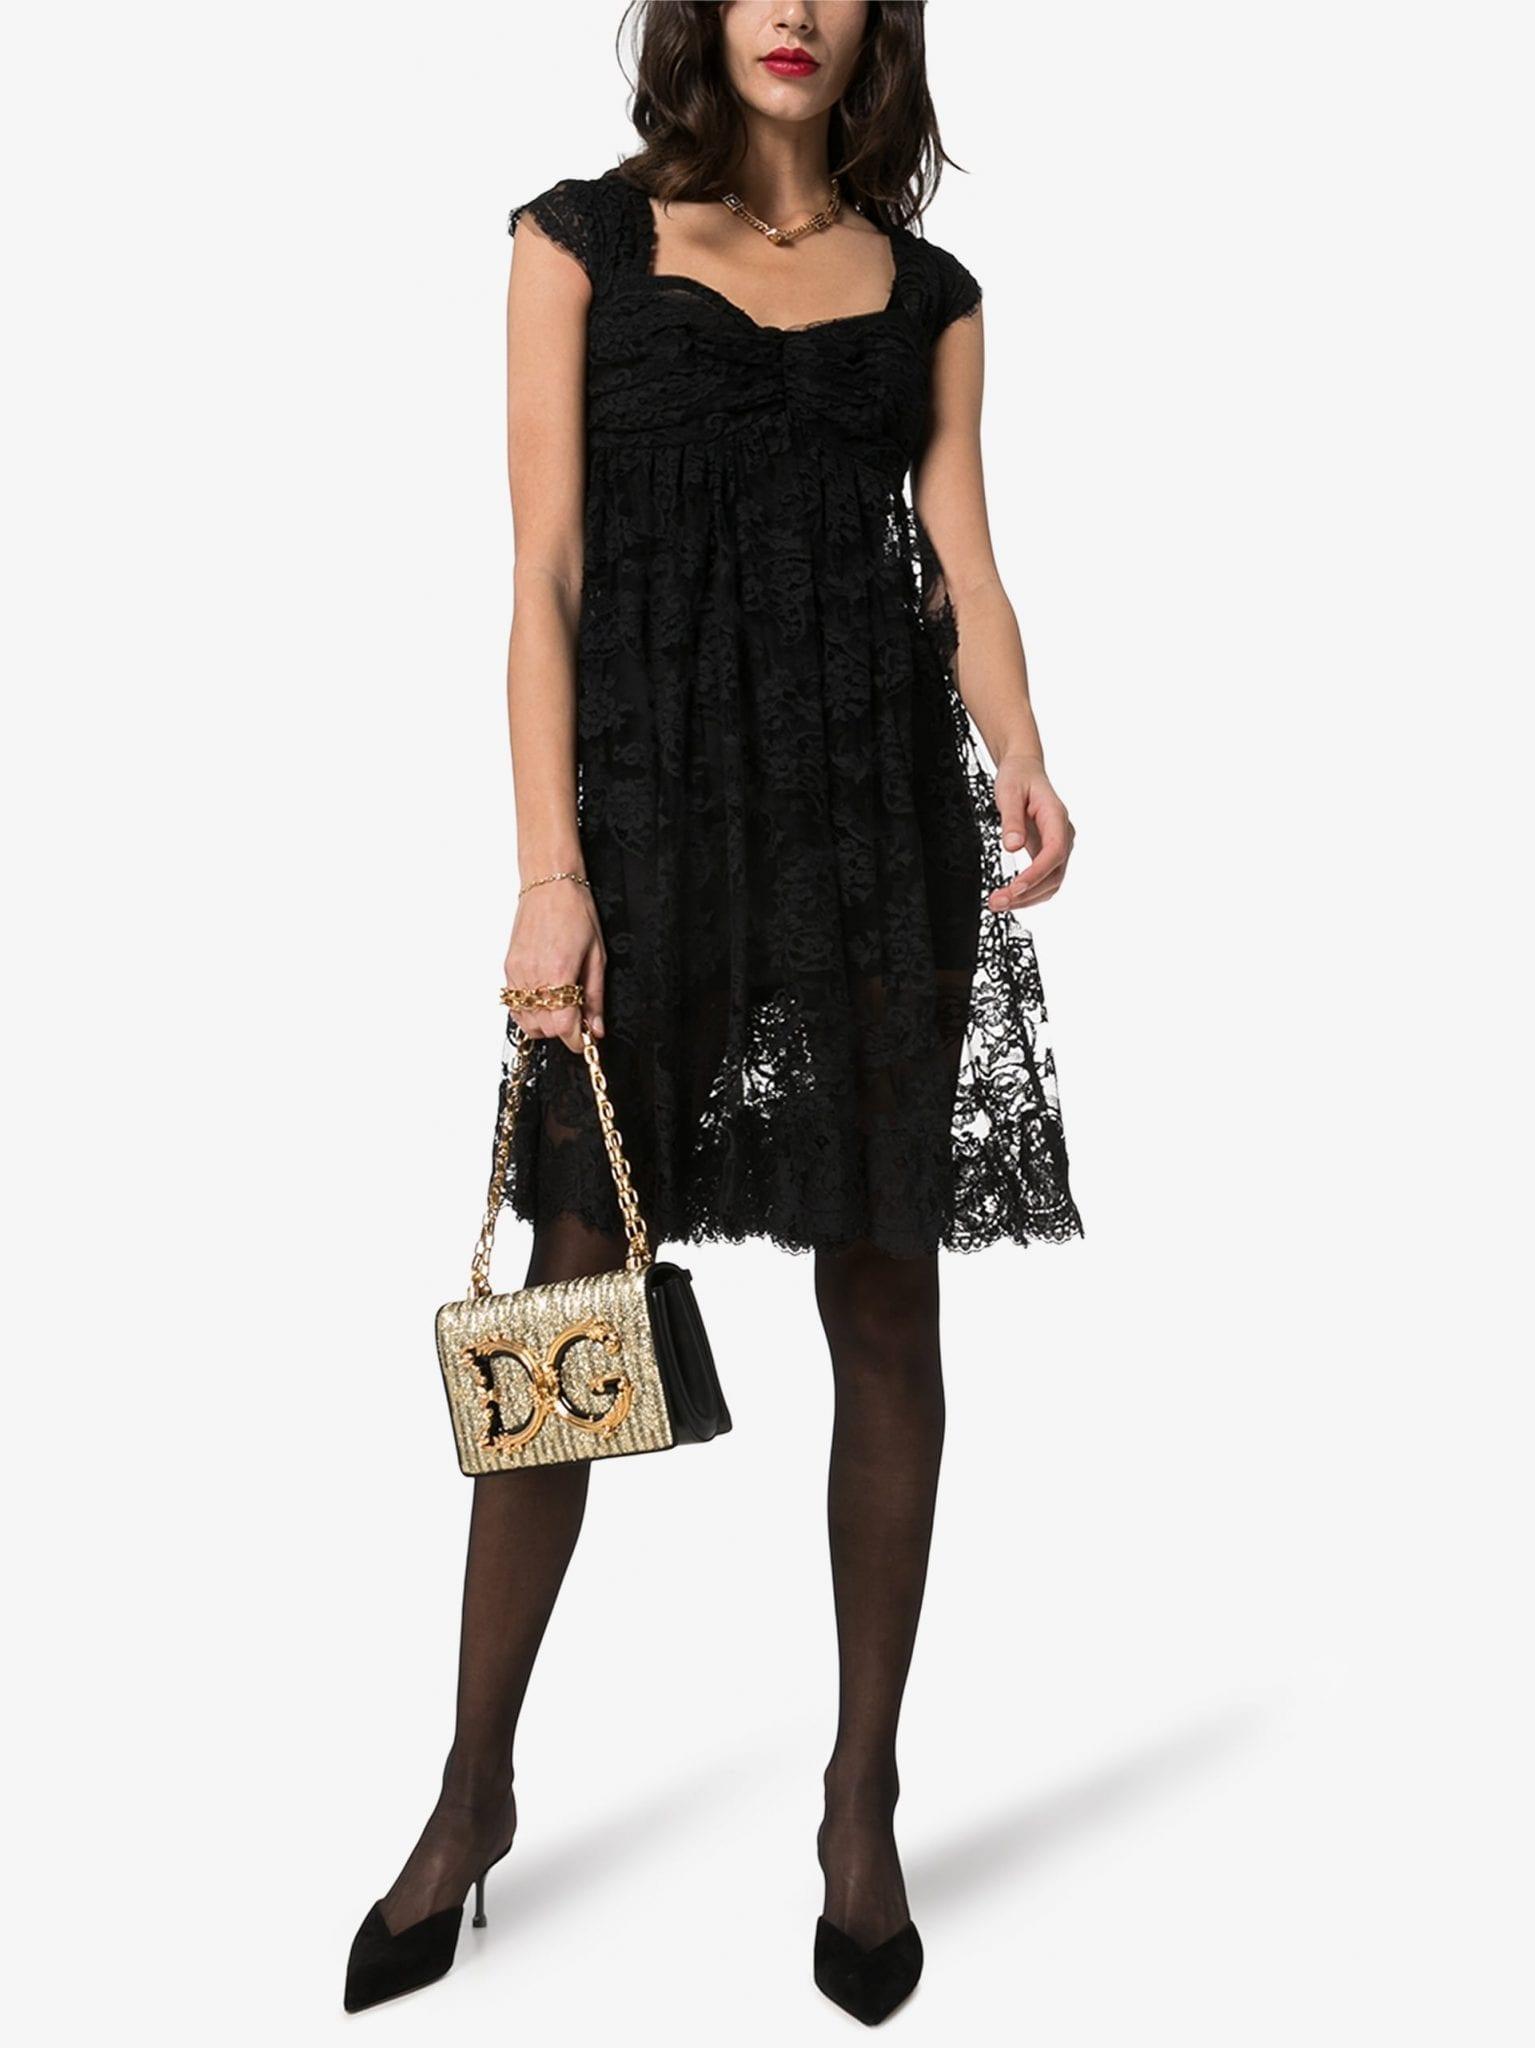 DOLCE & GABBANA Lined Lace Dress